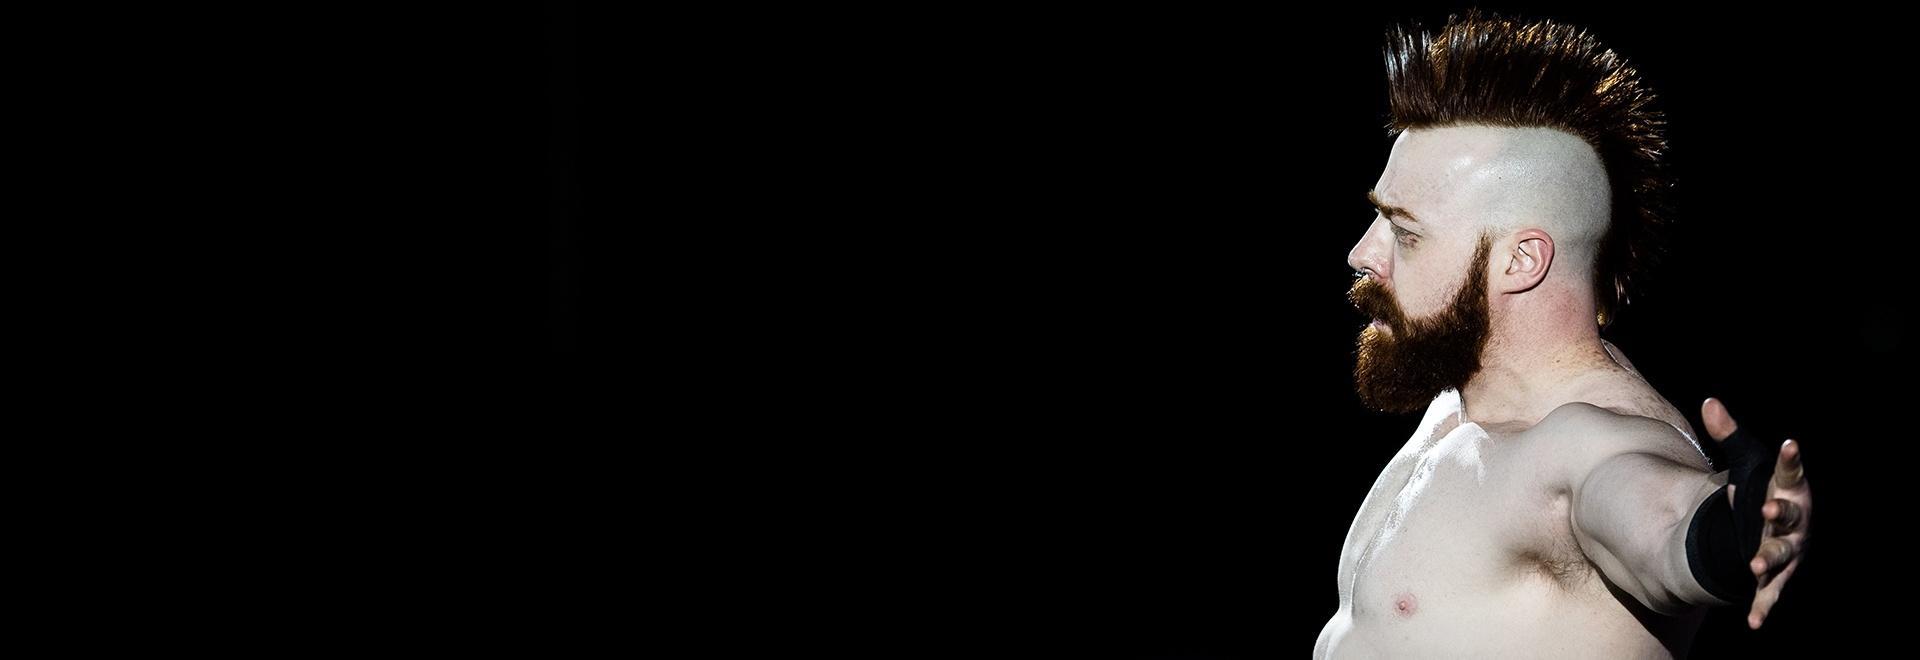 Ep. 23